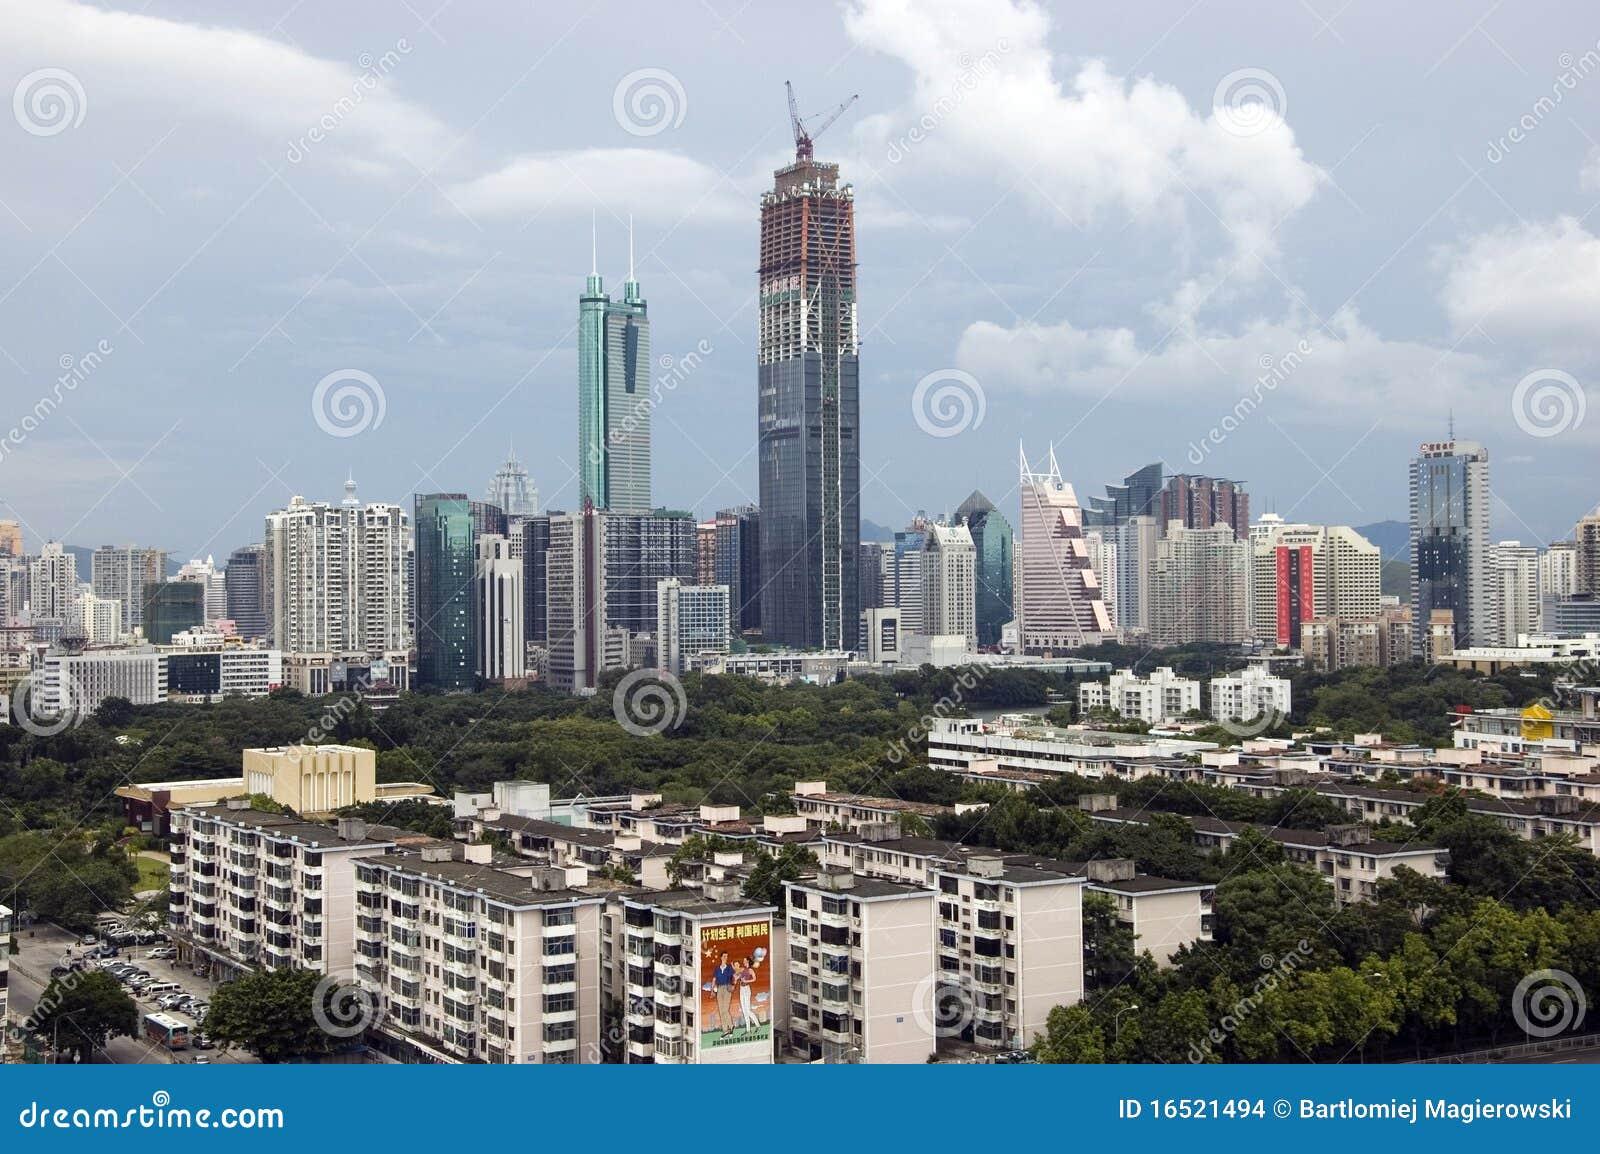 China, Shenzhen city skyscrapers